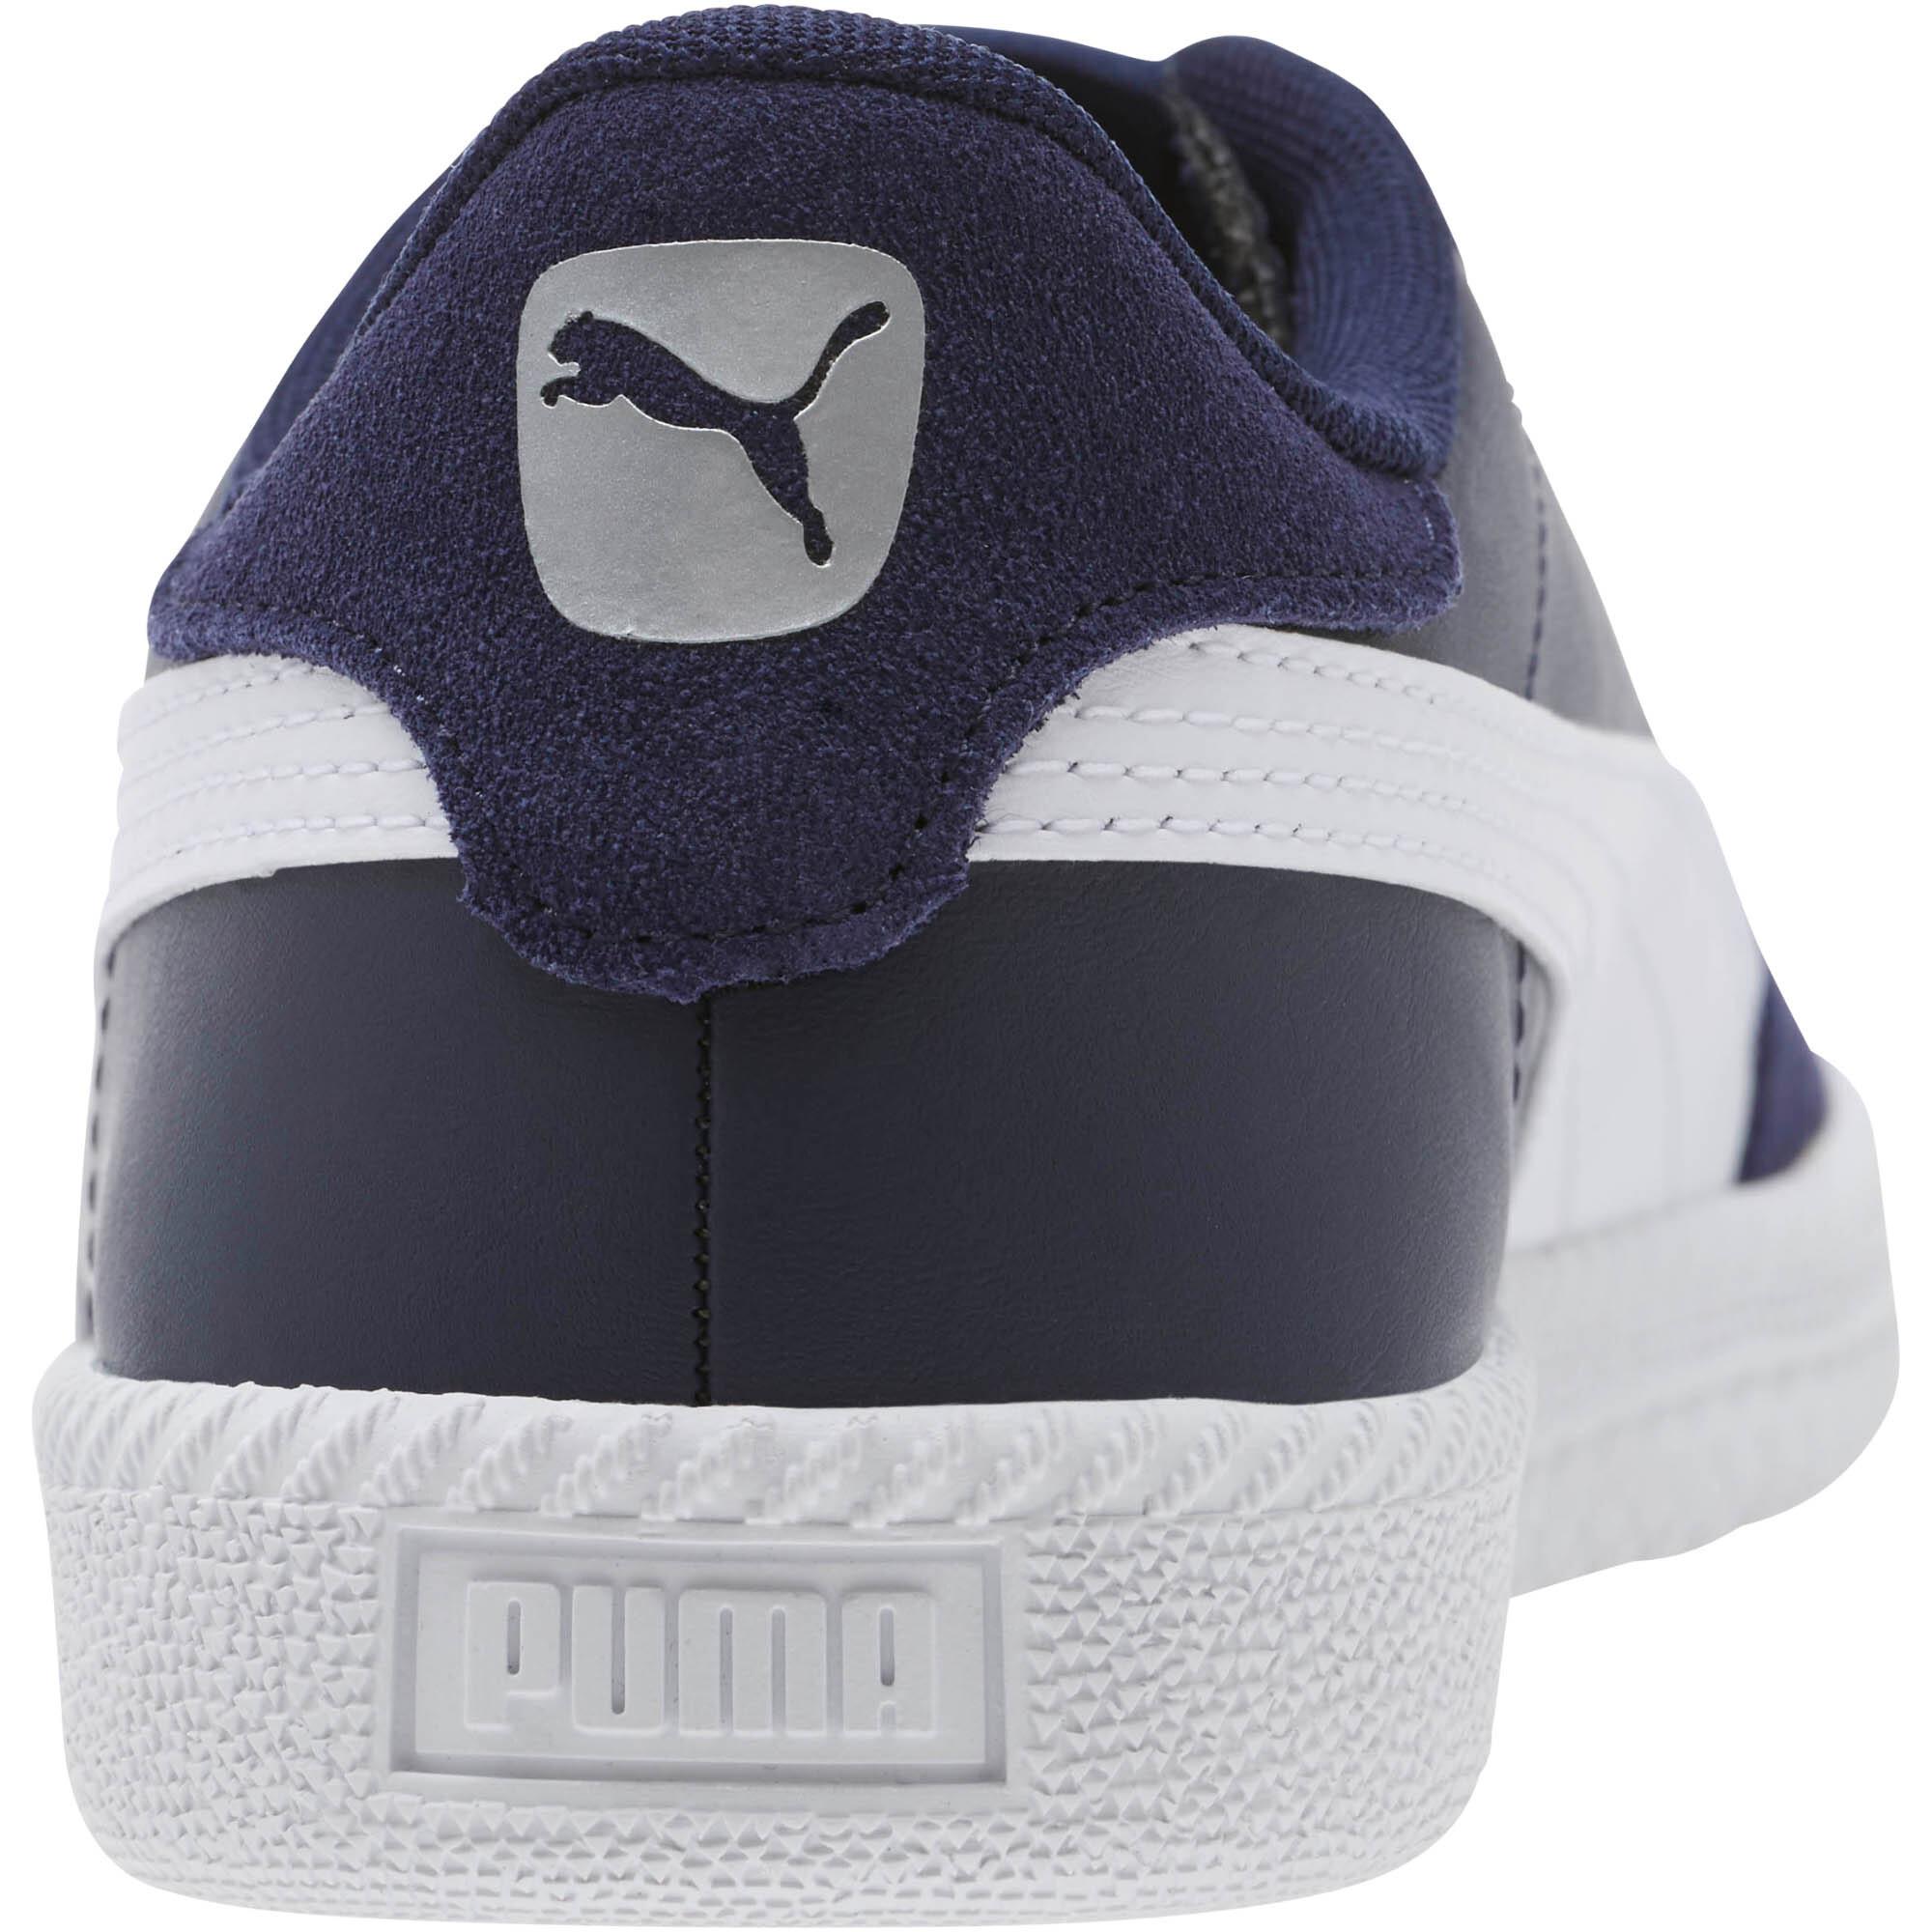 PUMA-Astro-Cup-Sneakers-Men-Shoe-Basics thumbnail 9